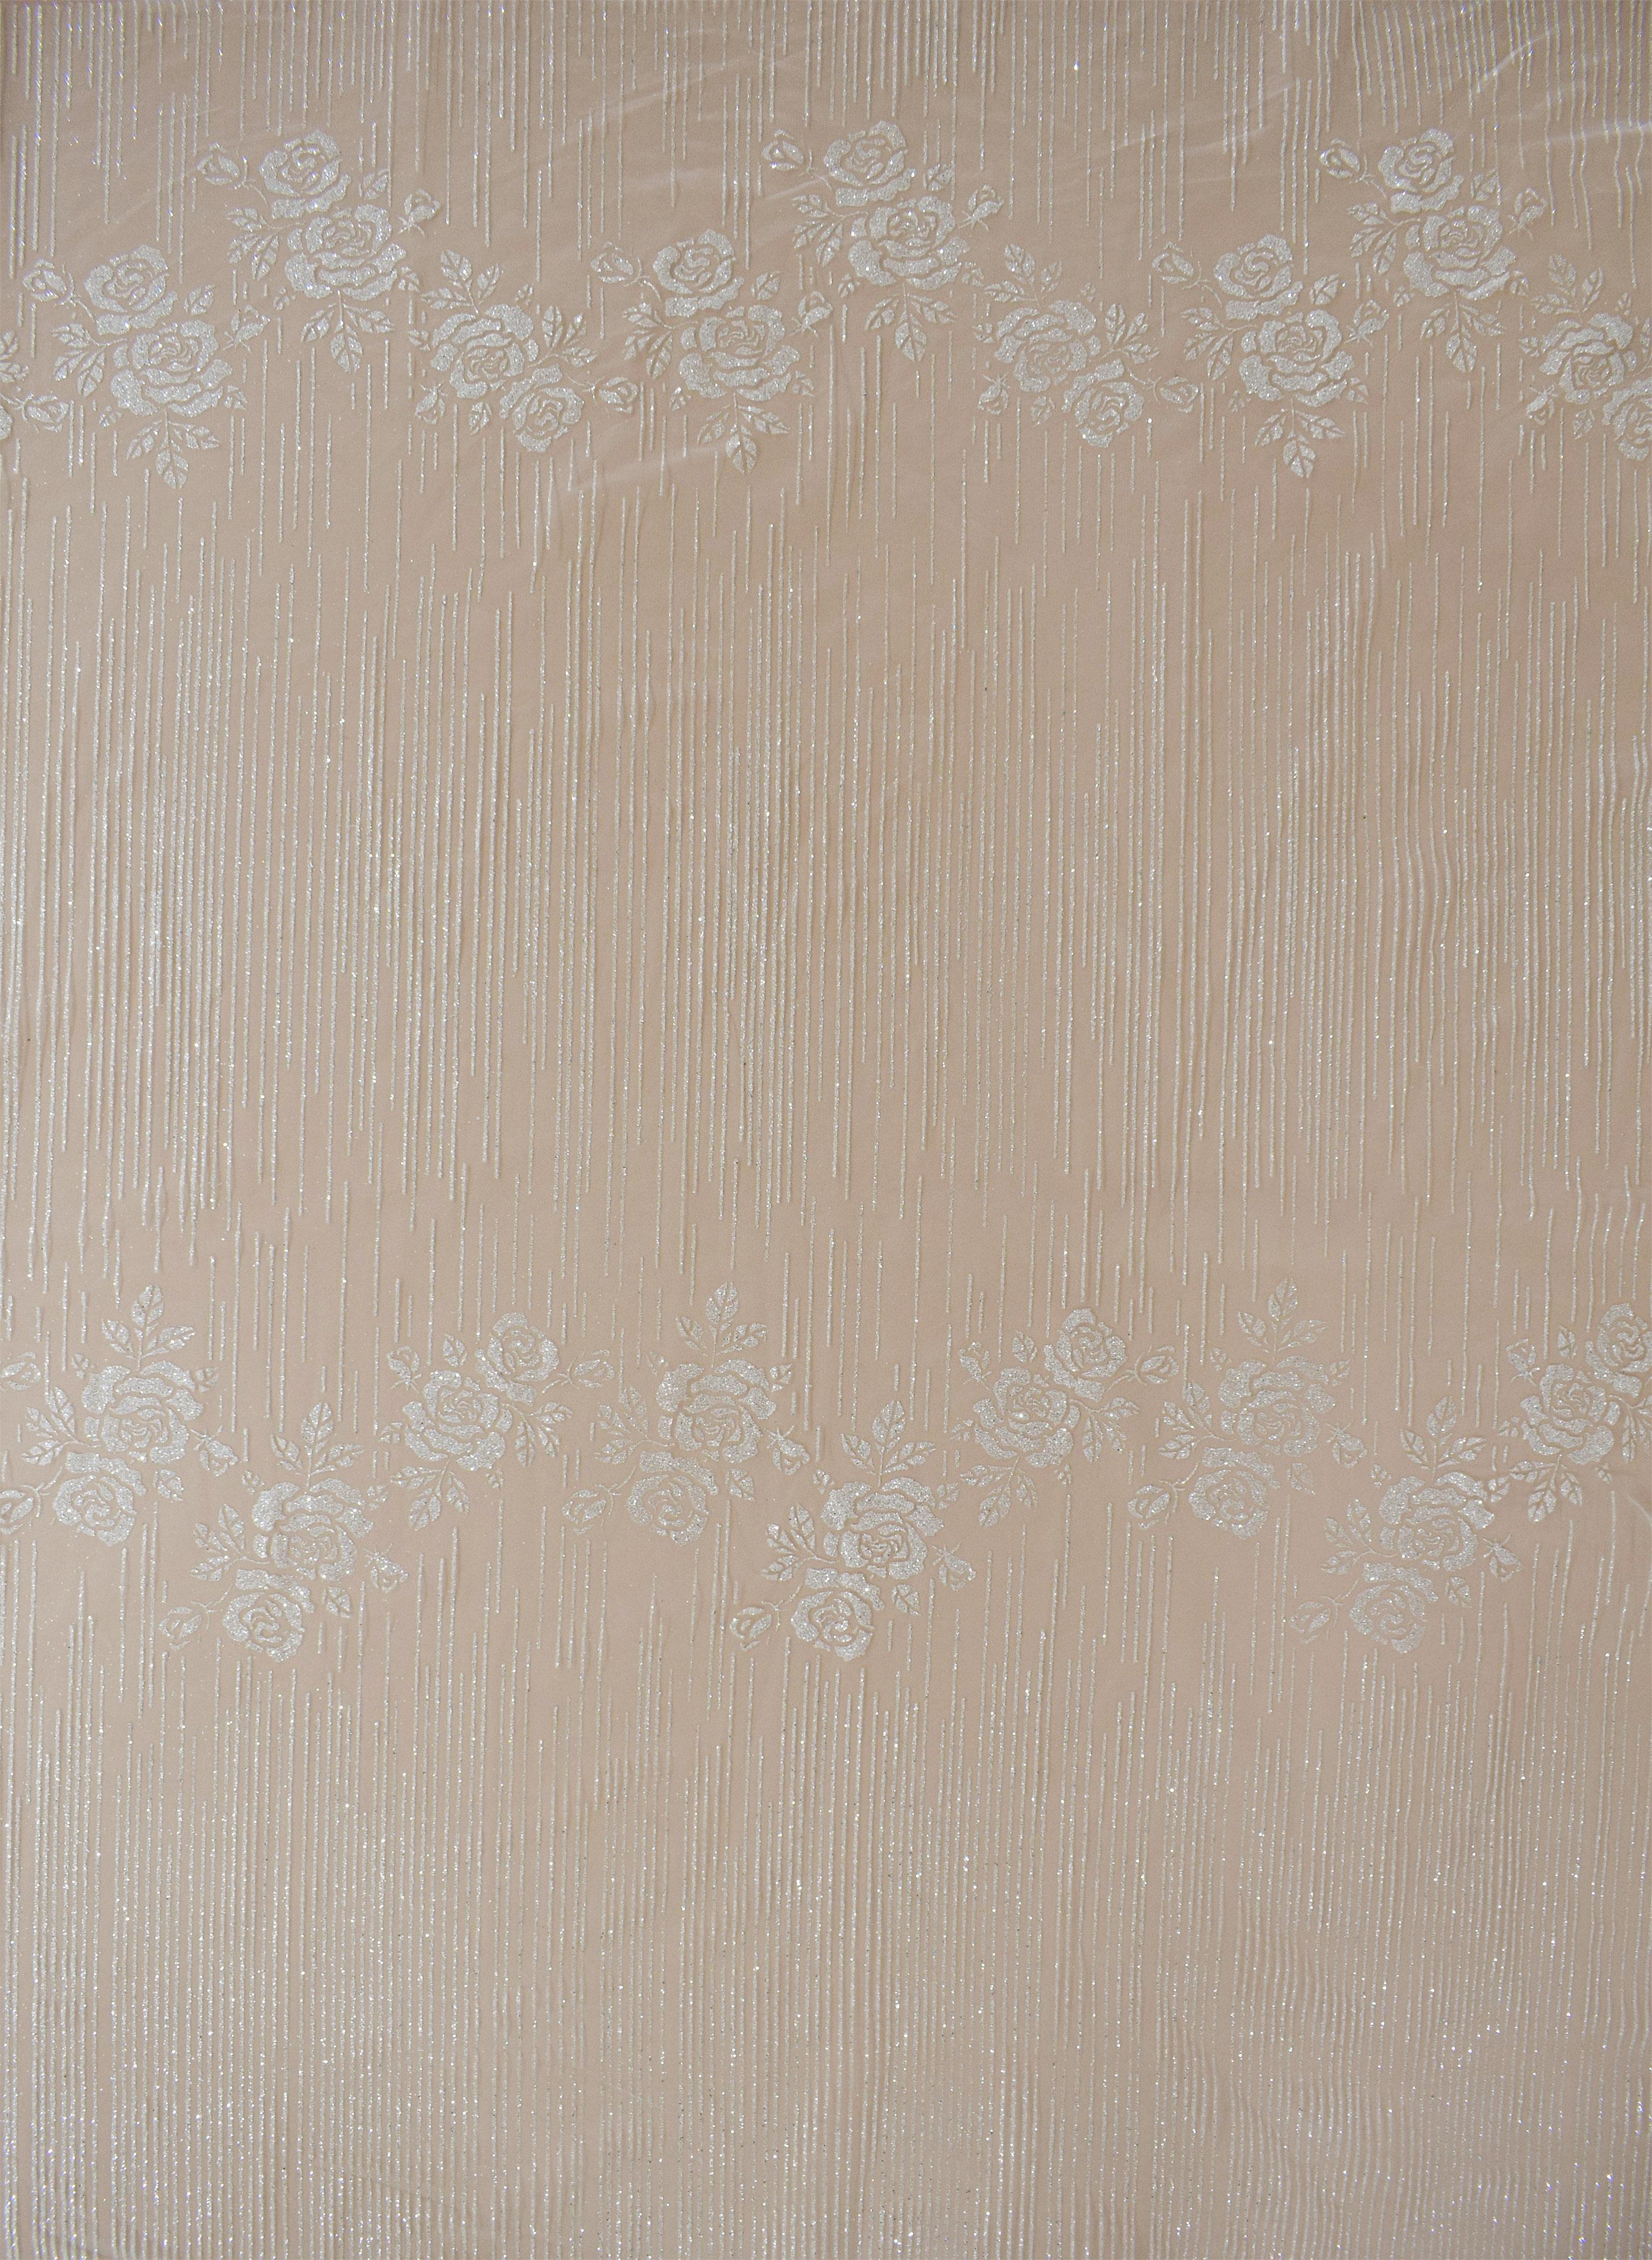 Fabric mesh: With glitter «AK-747»